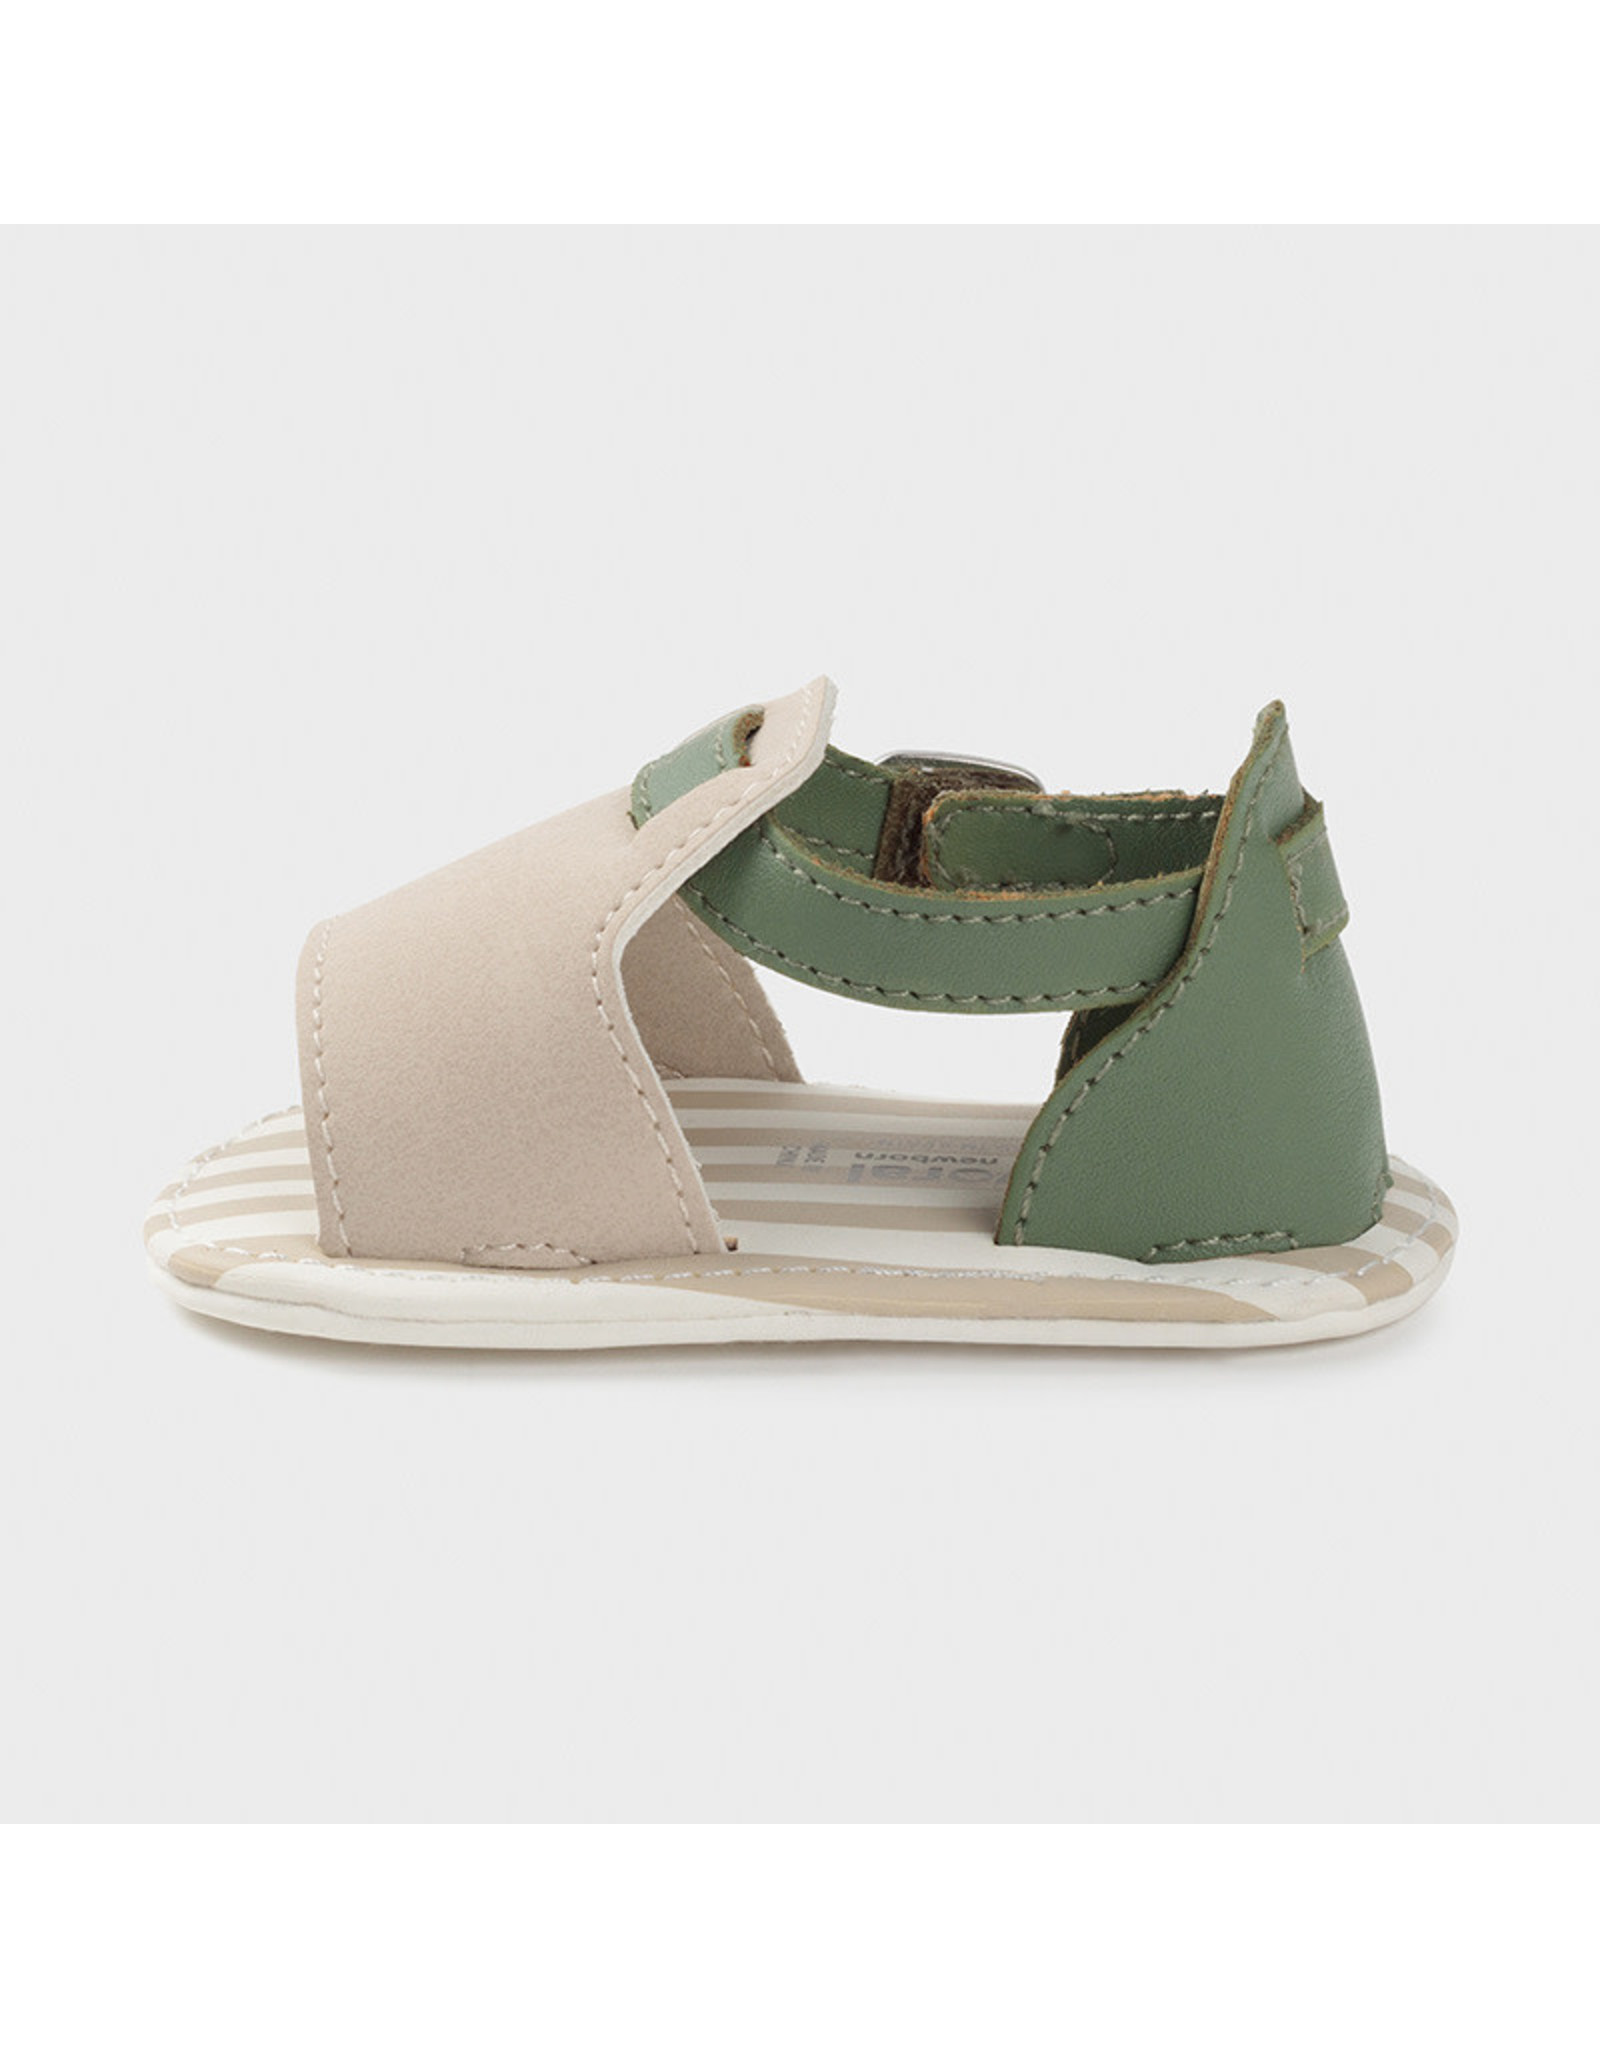 Mayoral Sandals - Beige